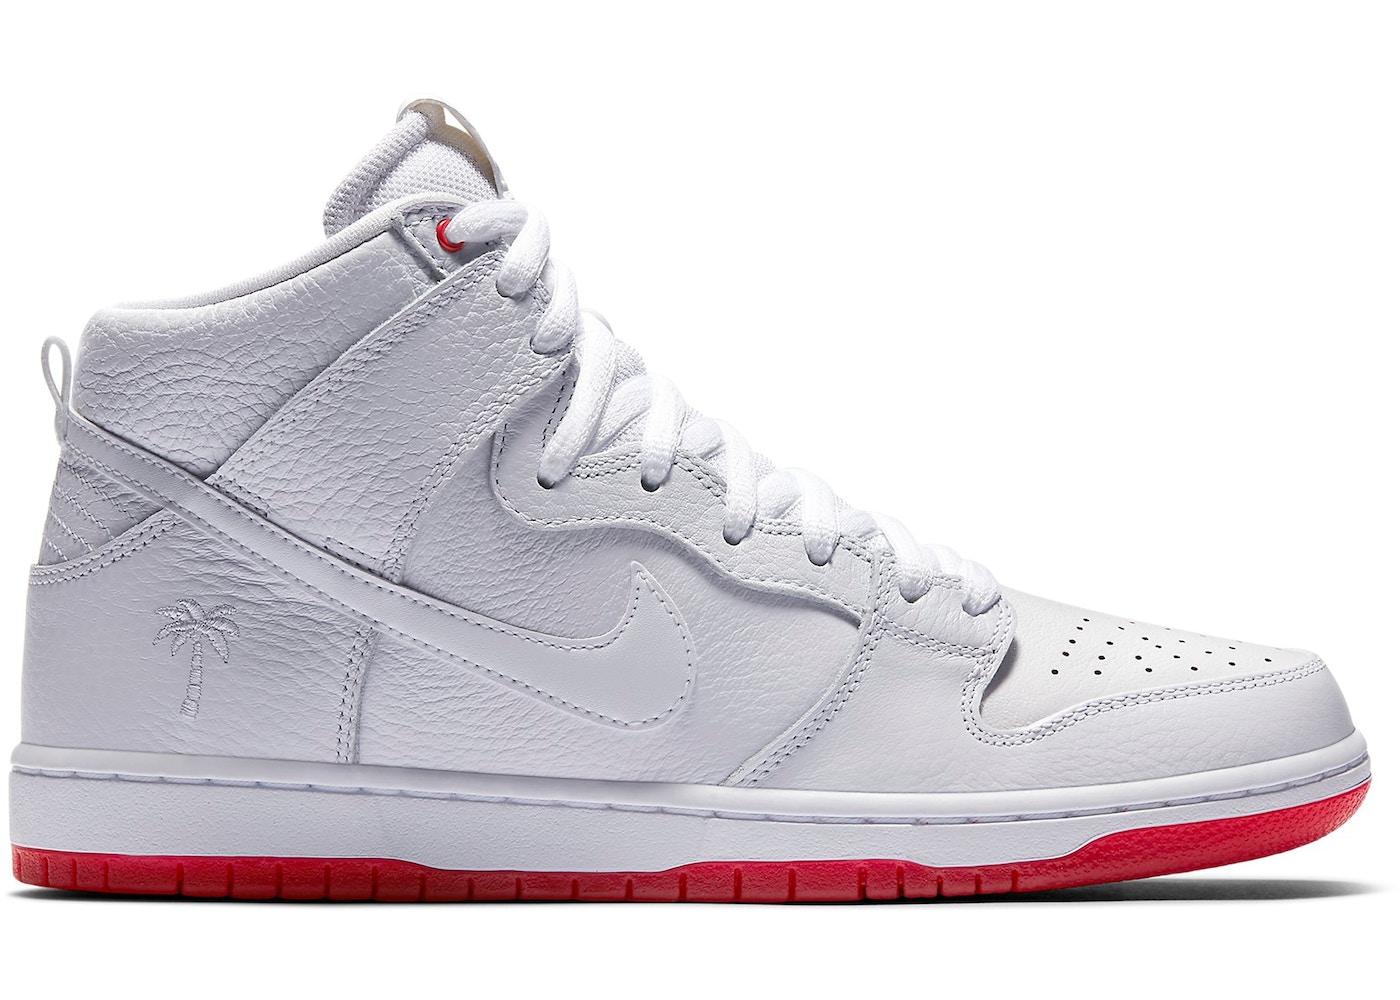 f584d03f632c2 Nike SB Dunk High Kevin Bradley - AH9613-116